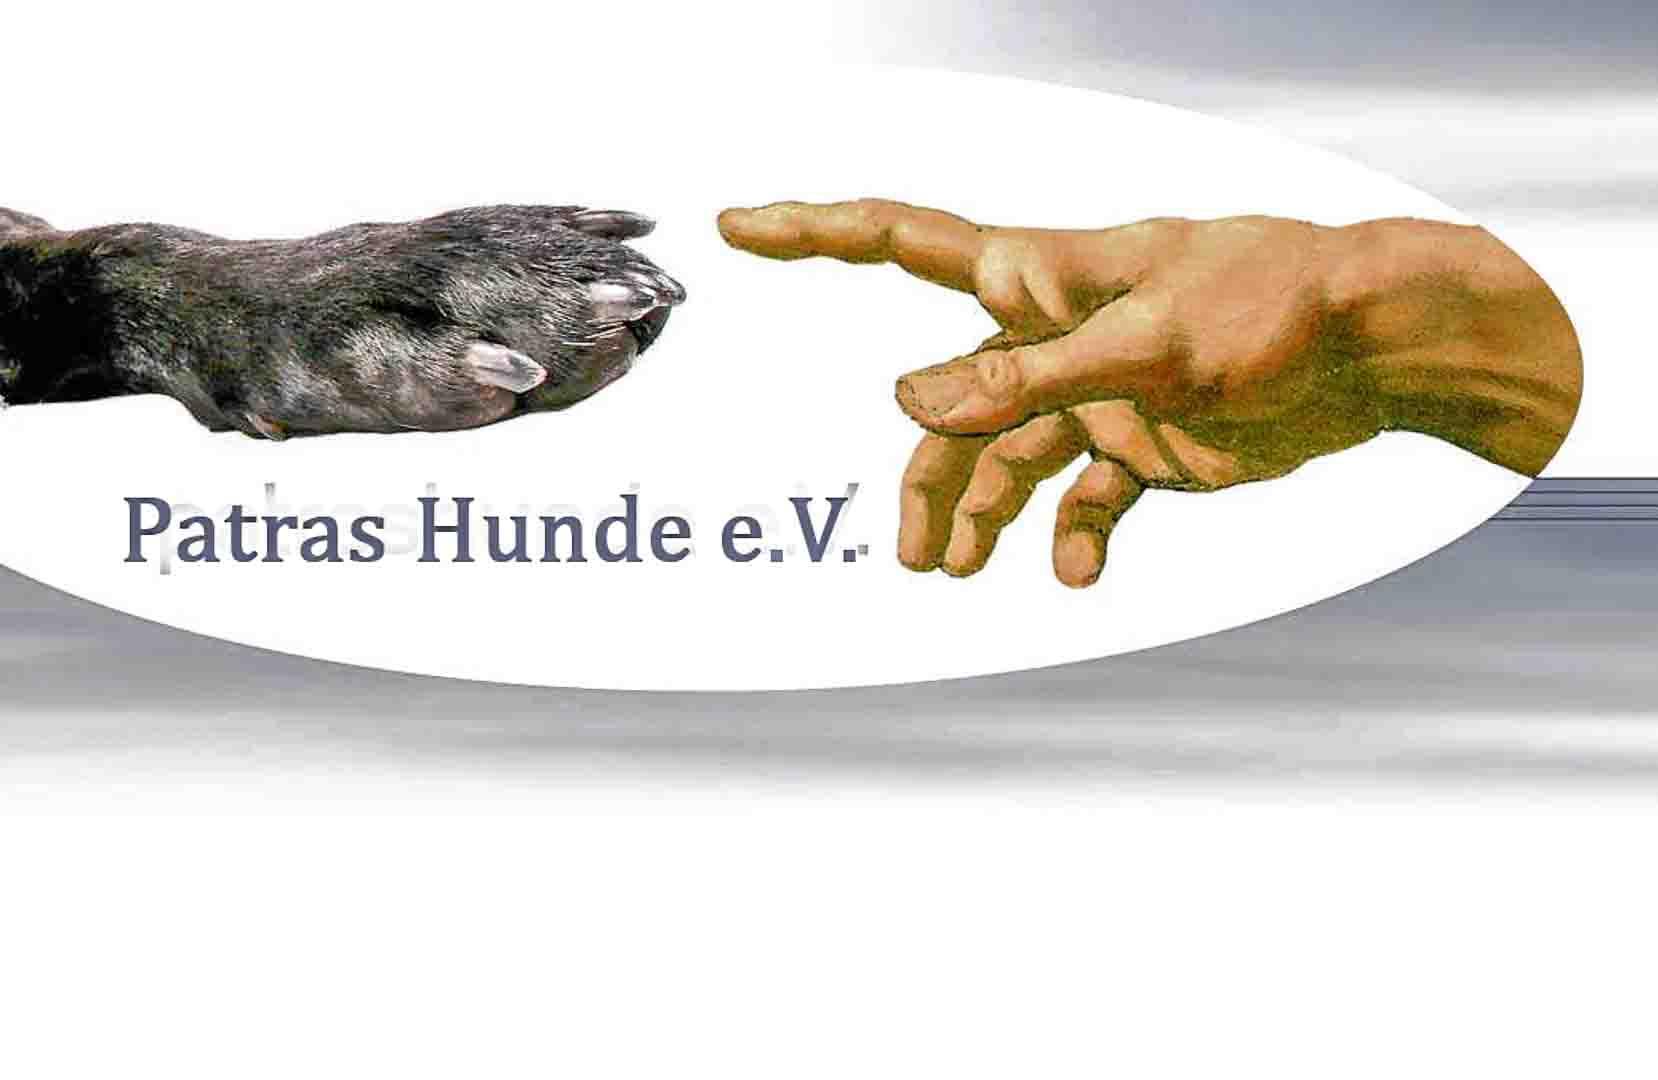 Patras-Hunde.de